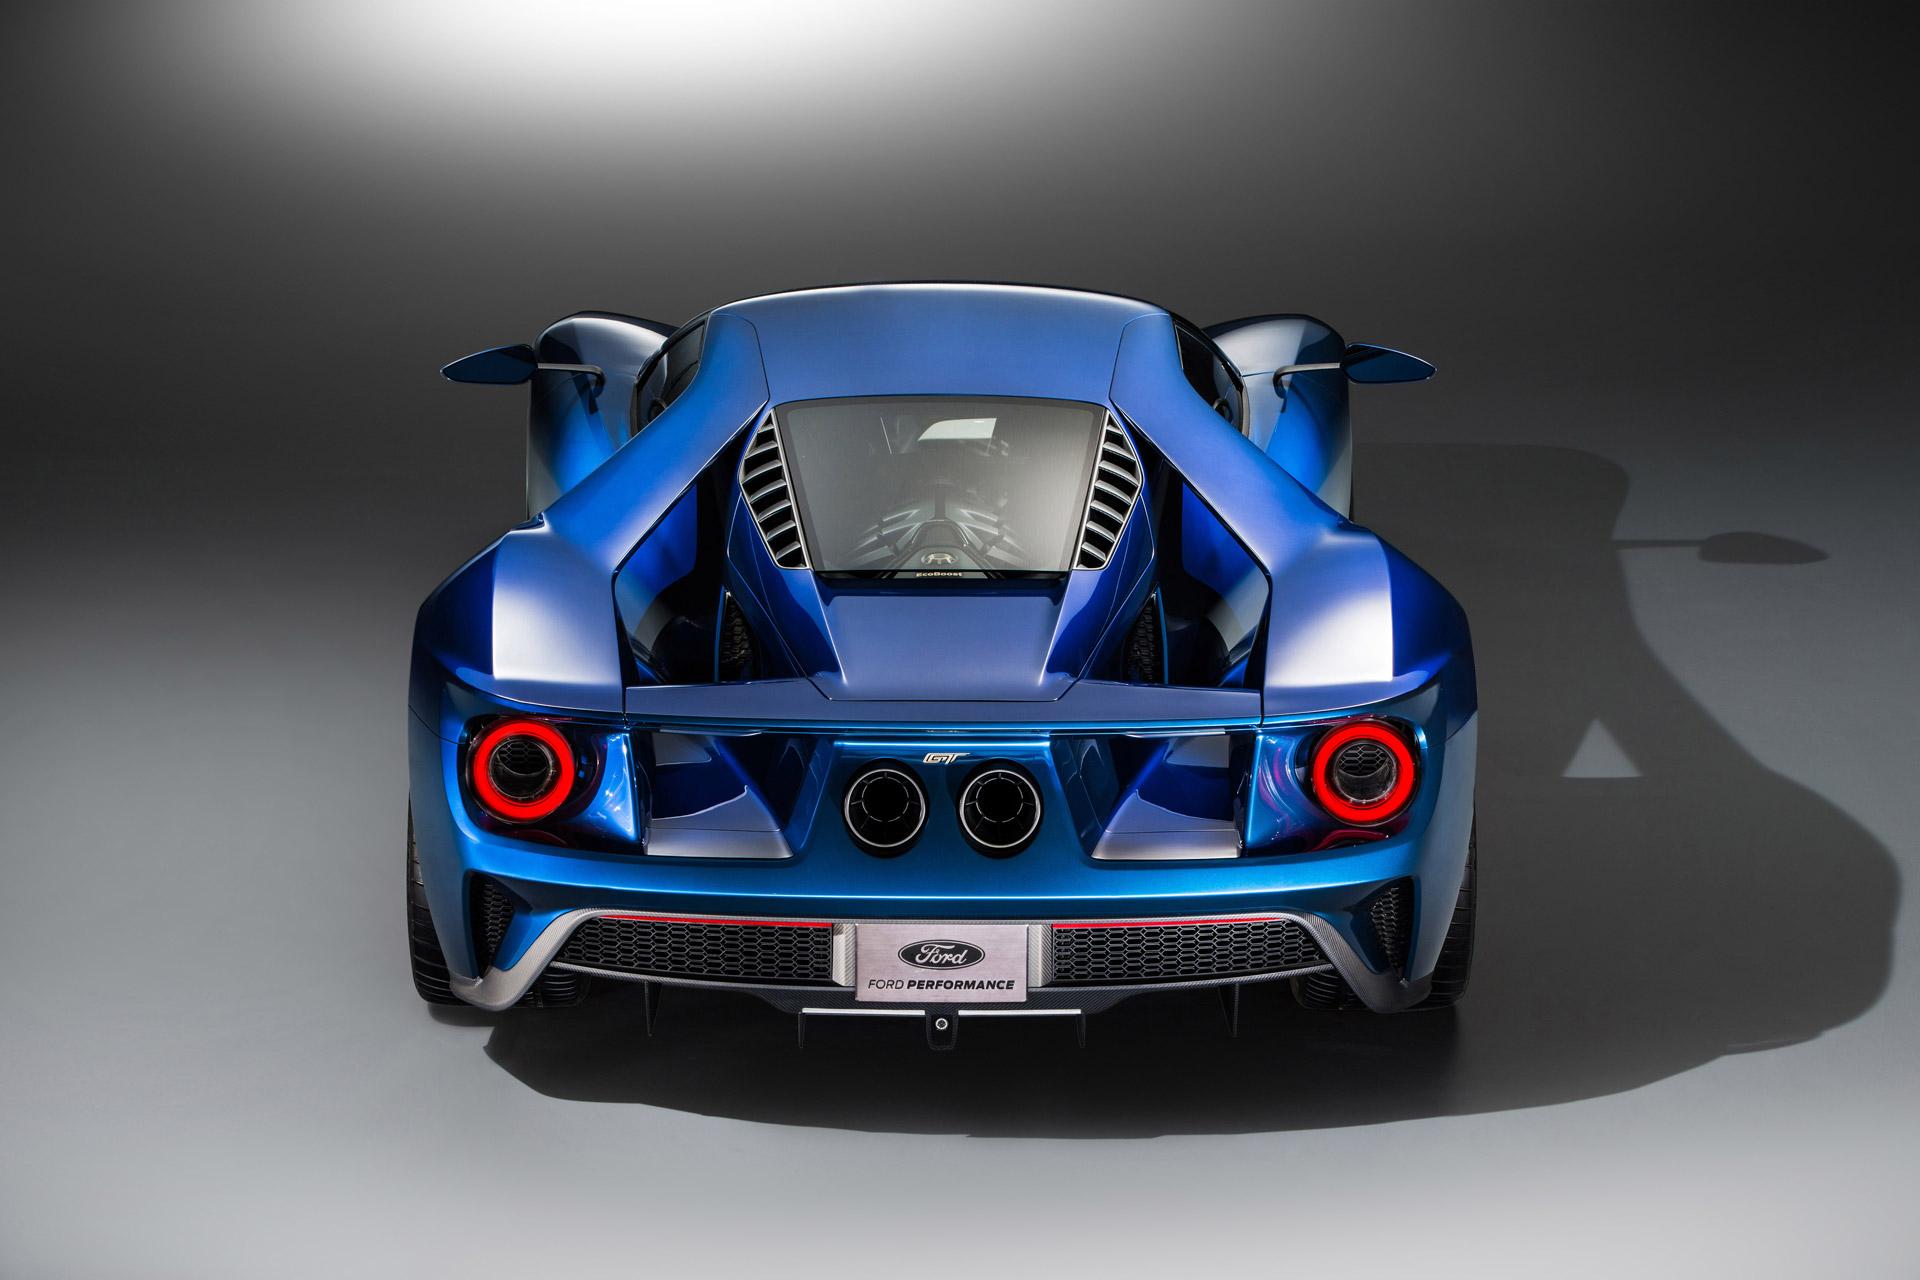 Gt350r Review >> Darth Vader Hot Wheels, Ford GT, 2016 Lamborghini Huracán ...